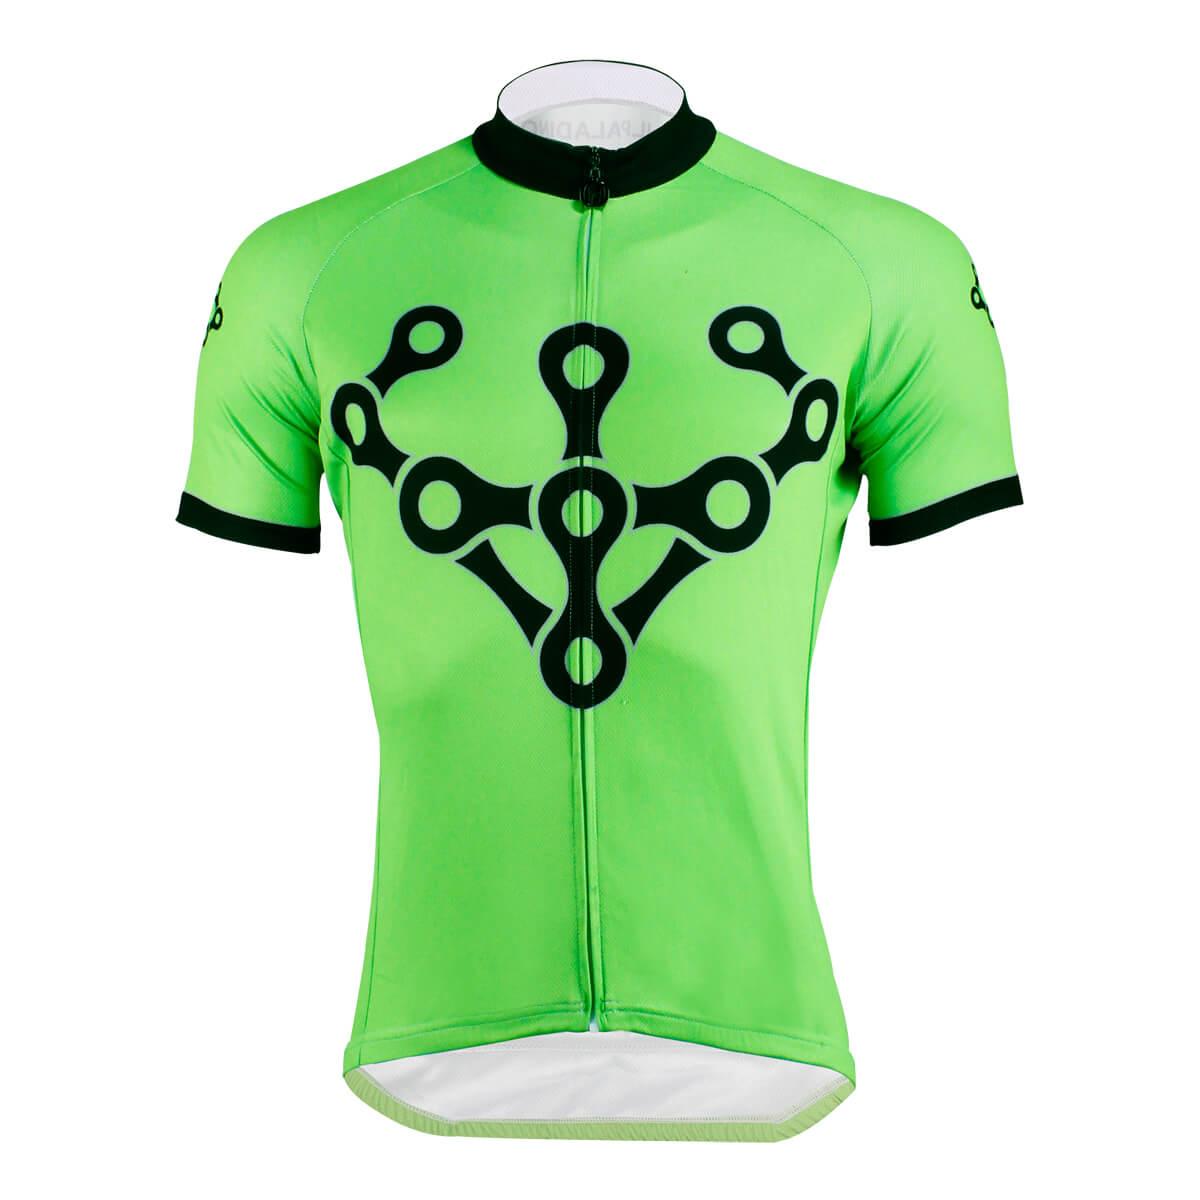 Bike Chain Design Cycling Jersey Green Short Sleeve Shirts For Men